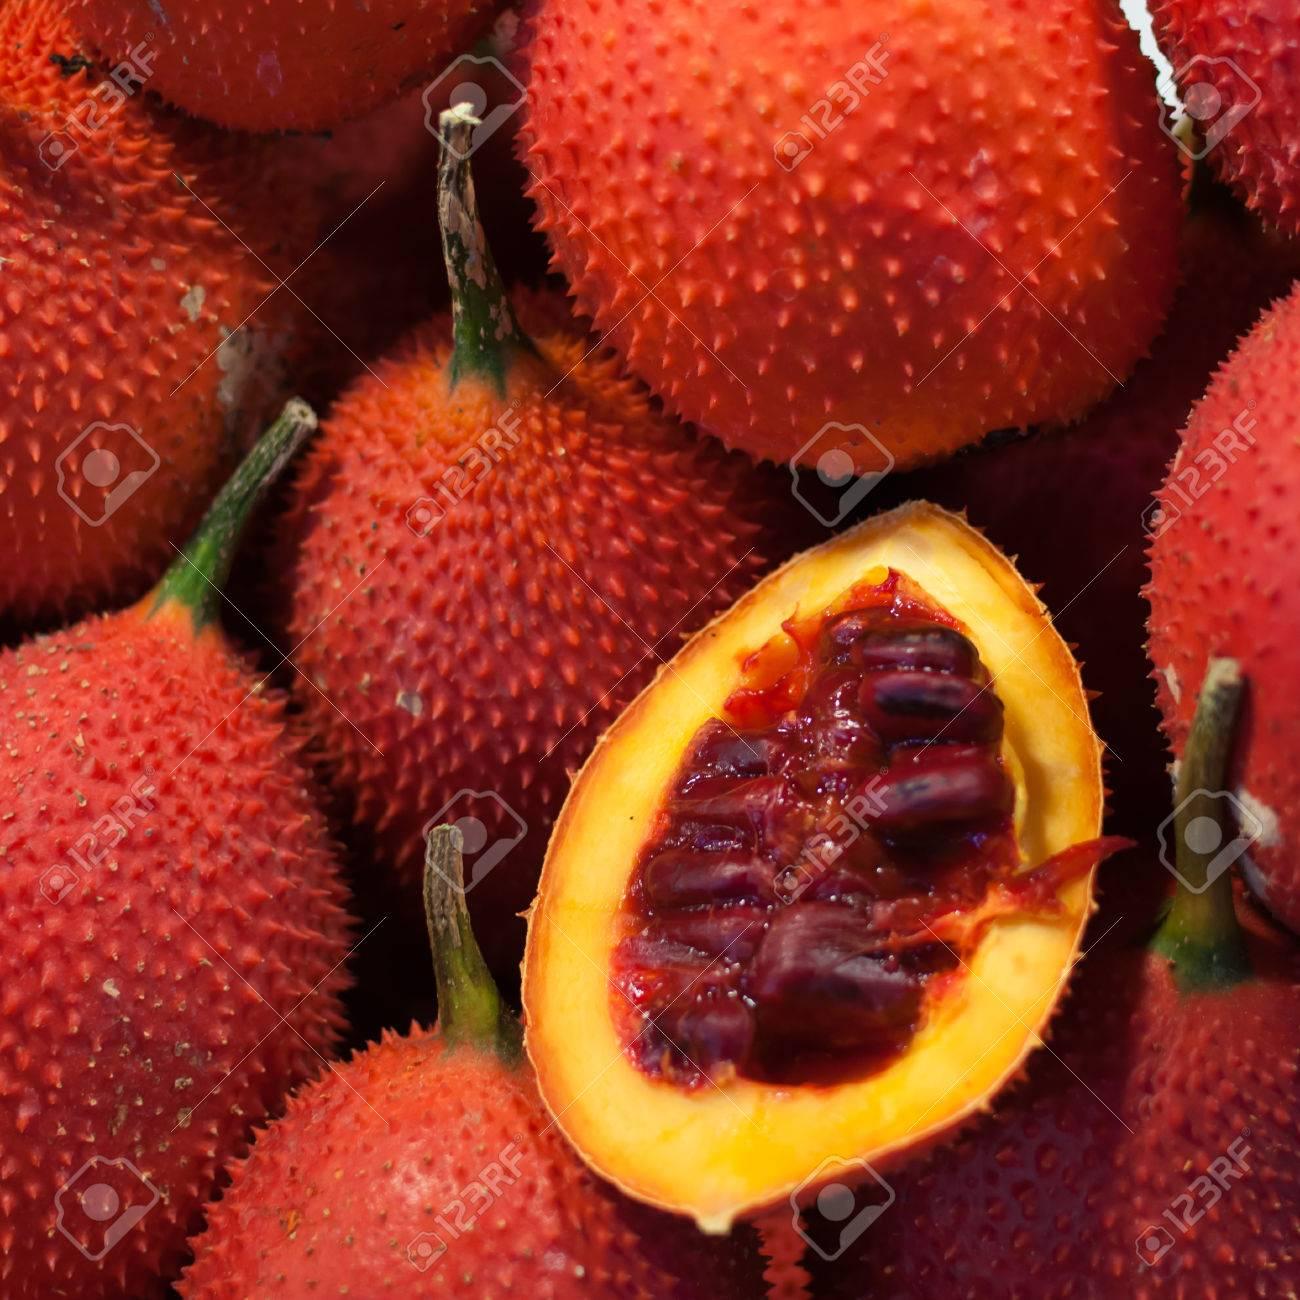 Gac Früchte, Babyjackfrucht, Stachel Bitterer Kürbis, Süße Kürbis ...